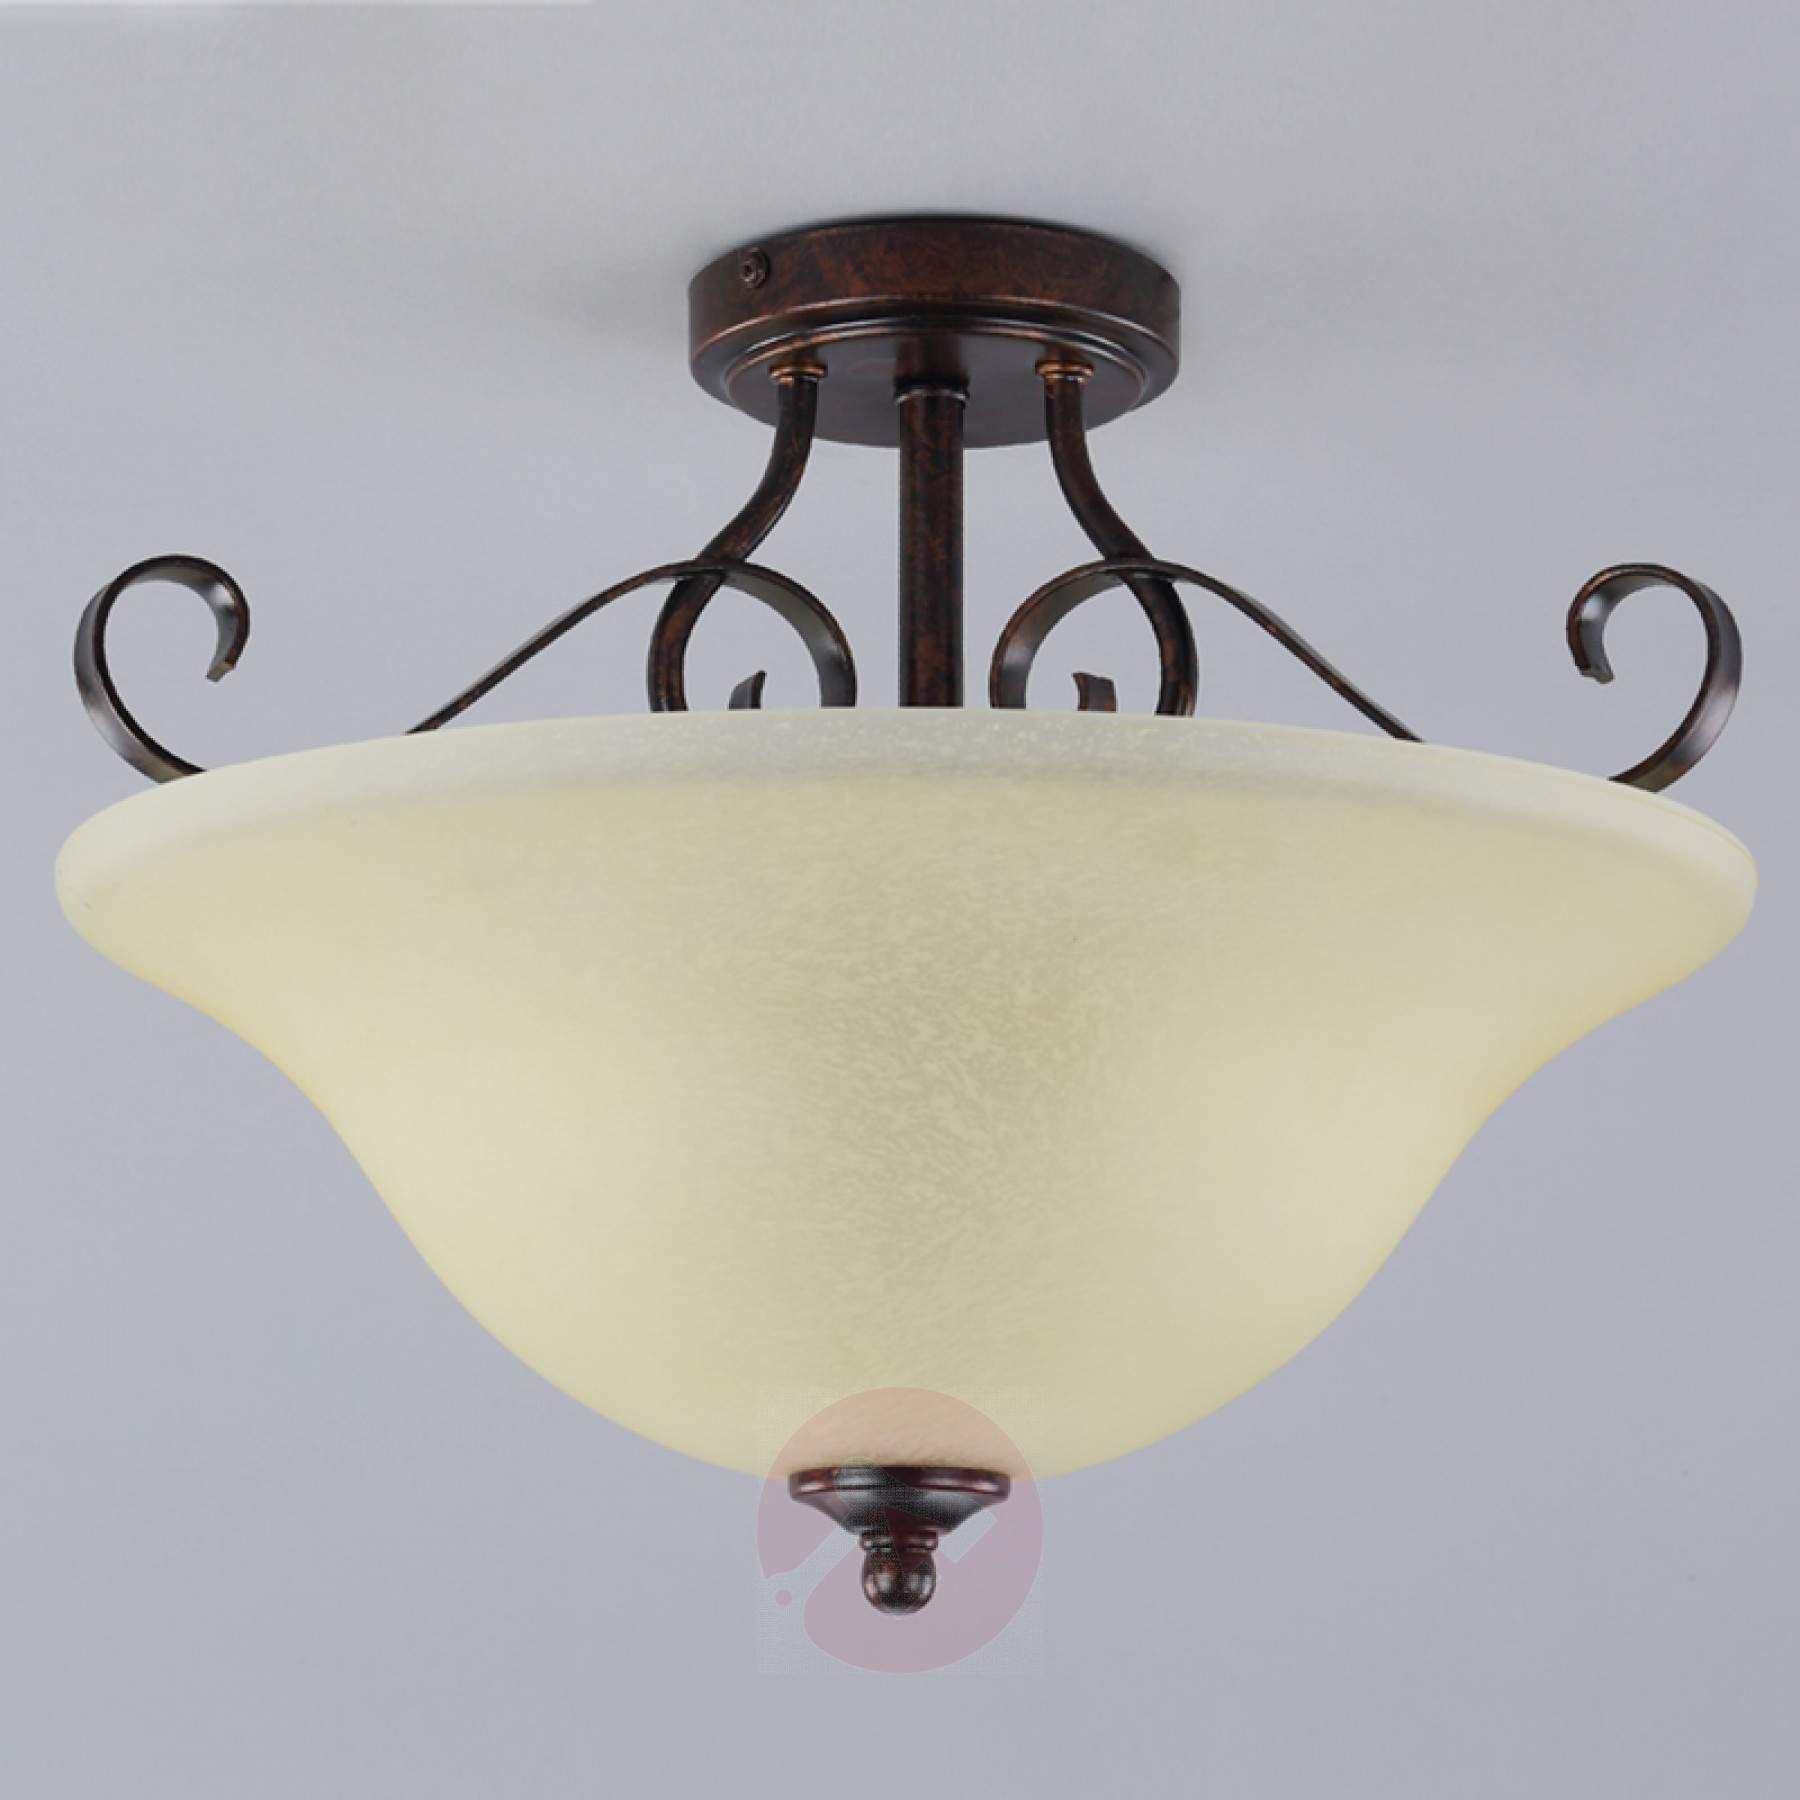 la encantador iluminacion cocina led para encantador lamparas de techo de led 16 gem bezel ring chandelier chb0039 0d diseno para iluminacion cocina led